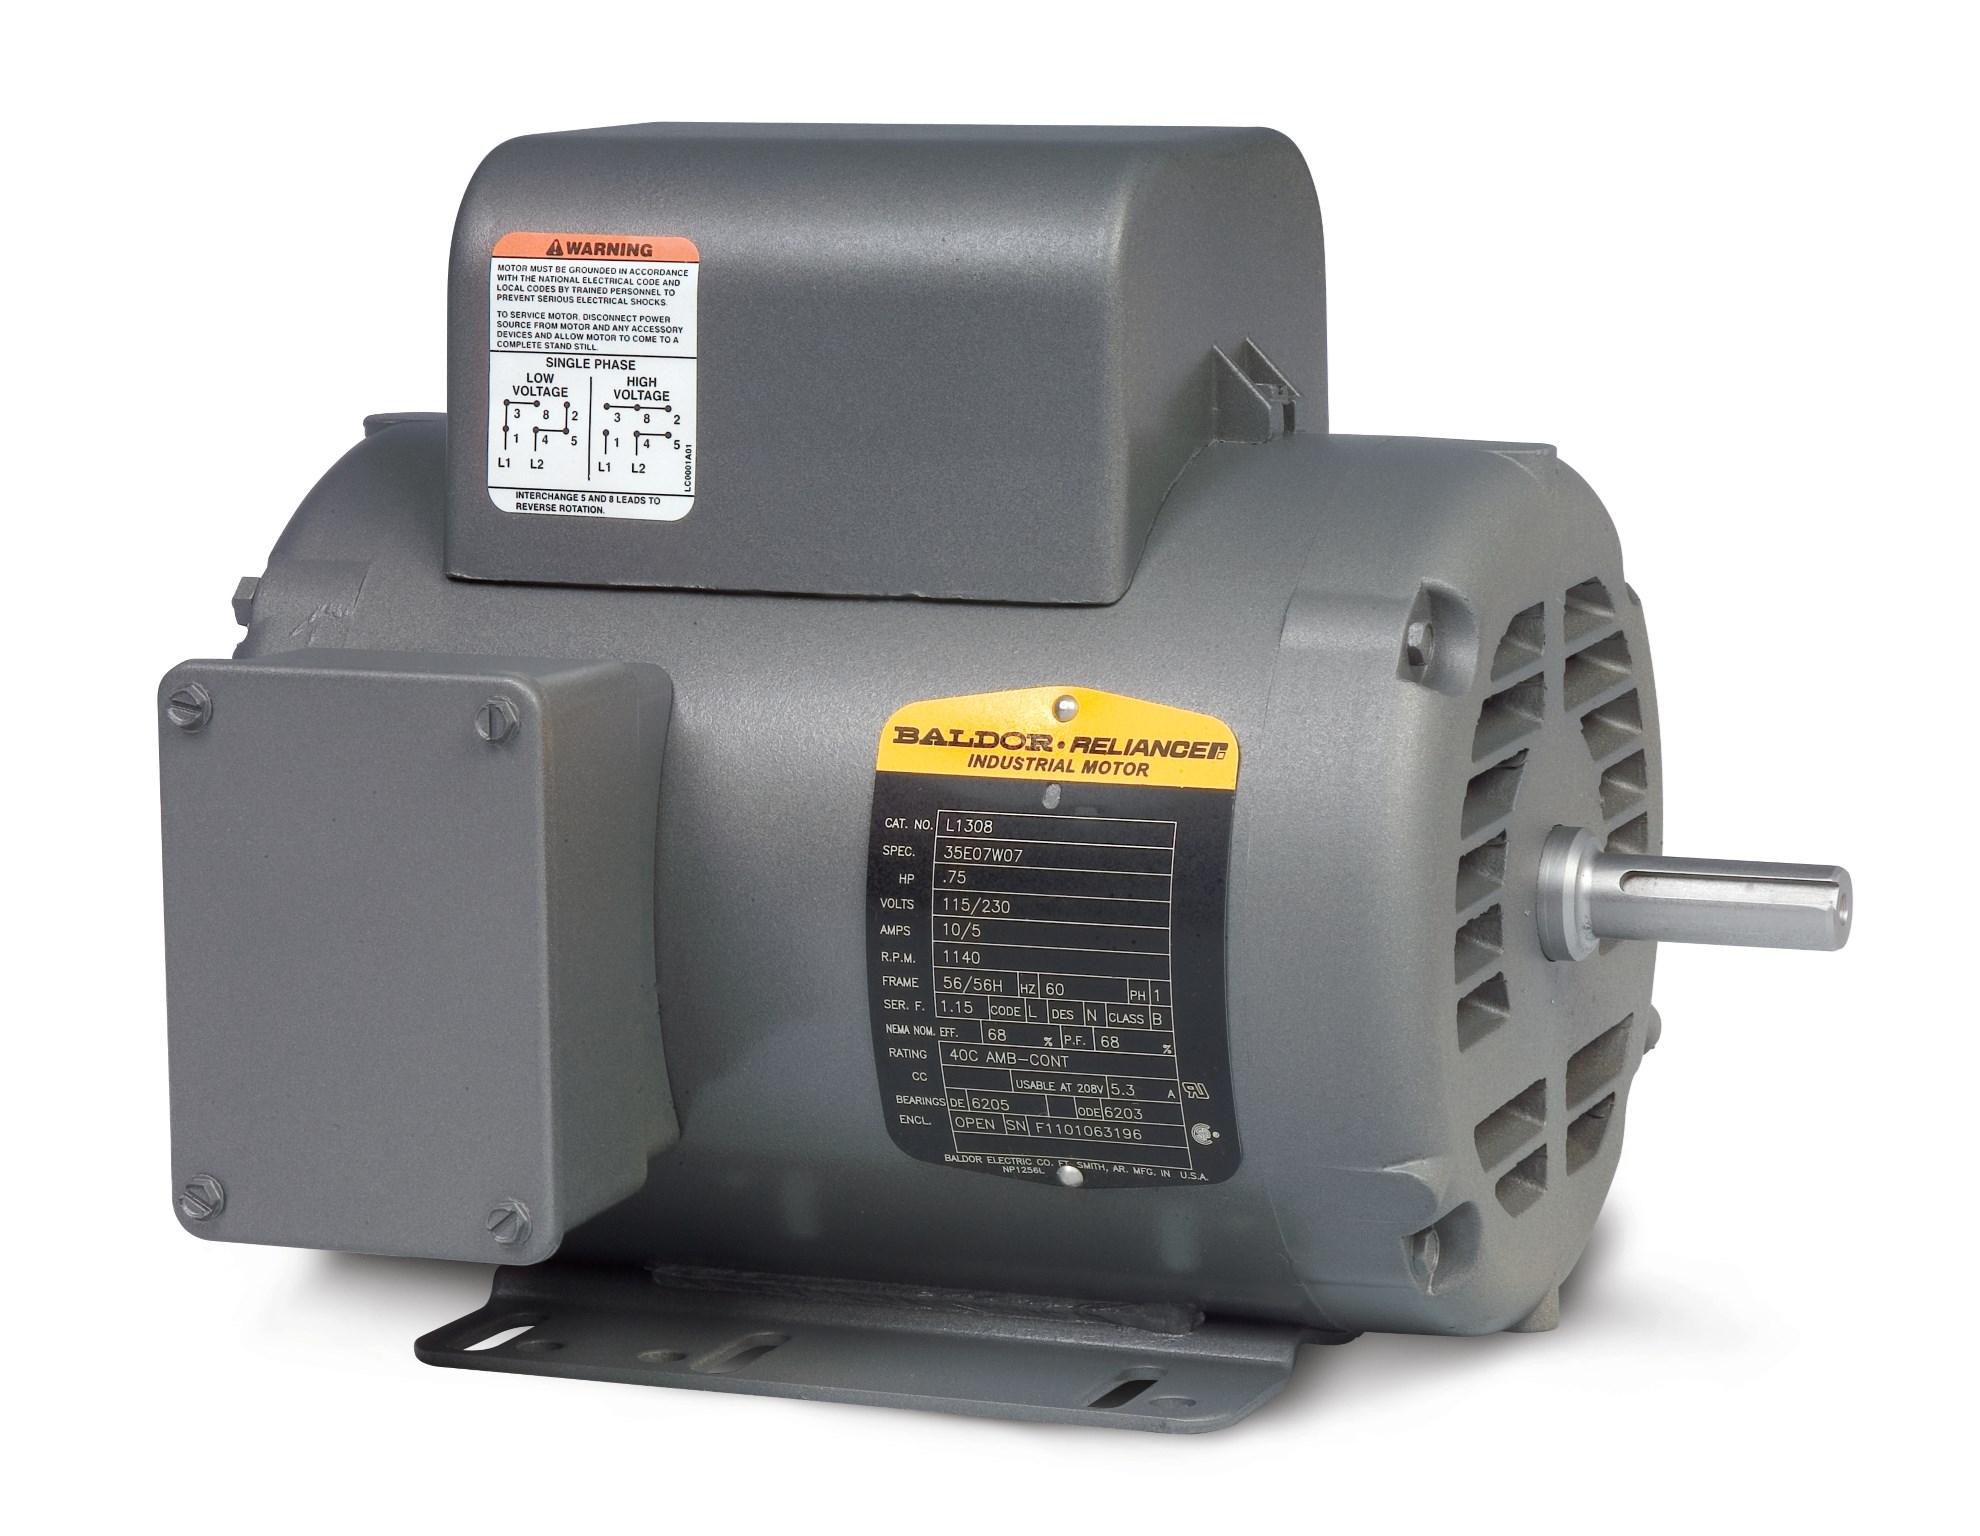 baldor l1410t wiring diagram 220 electric motor wiring diagram baldor motor wiring diagrams single phase baldor high voltage and low voltage wiring